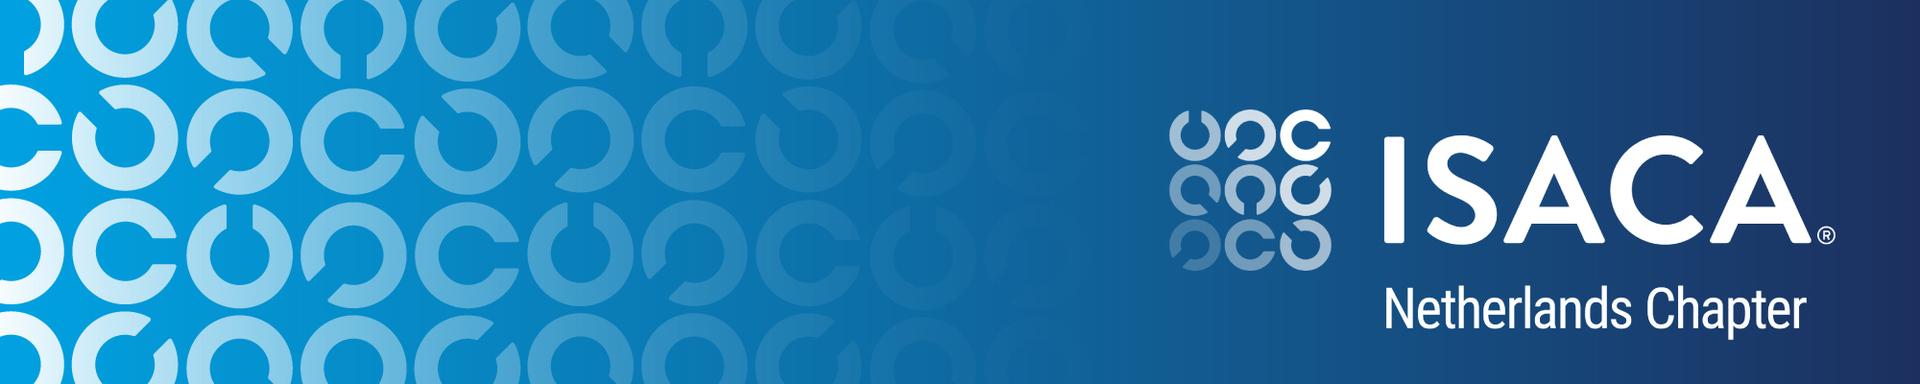 ISO27701 (Privacy Information Management System) Lead Auditor training najaar 2020 (Kopie)